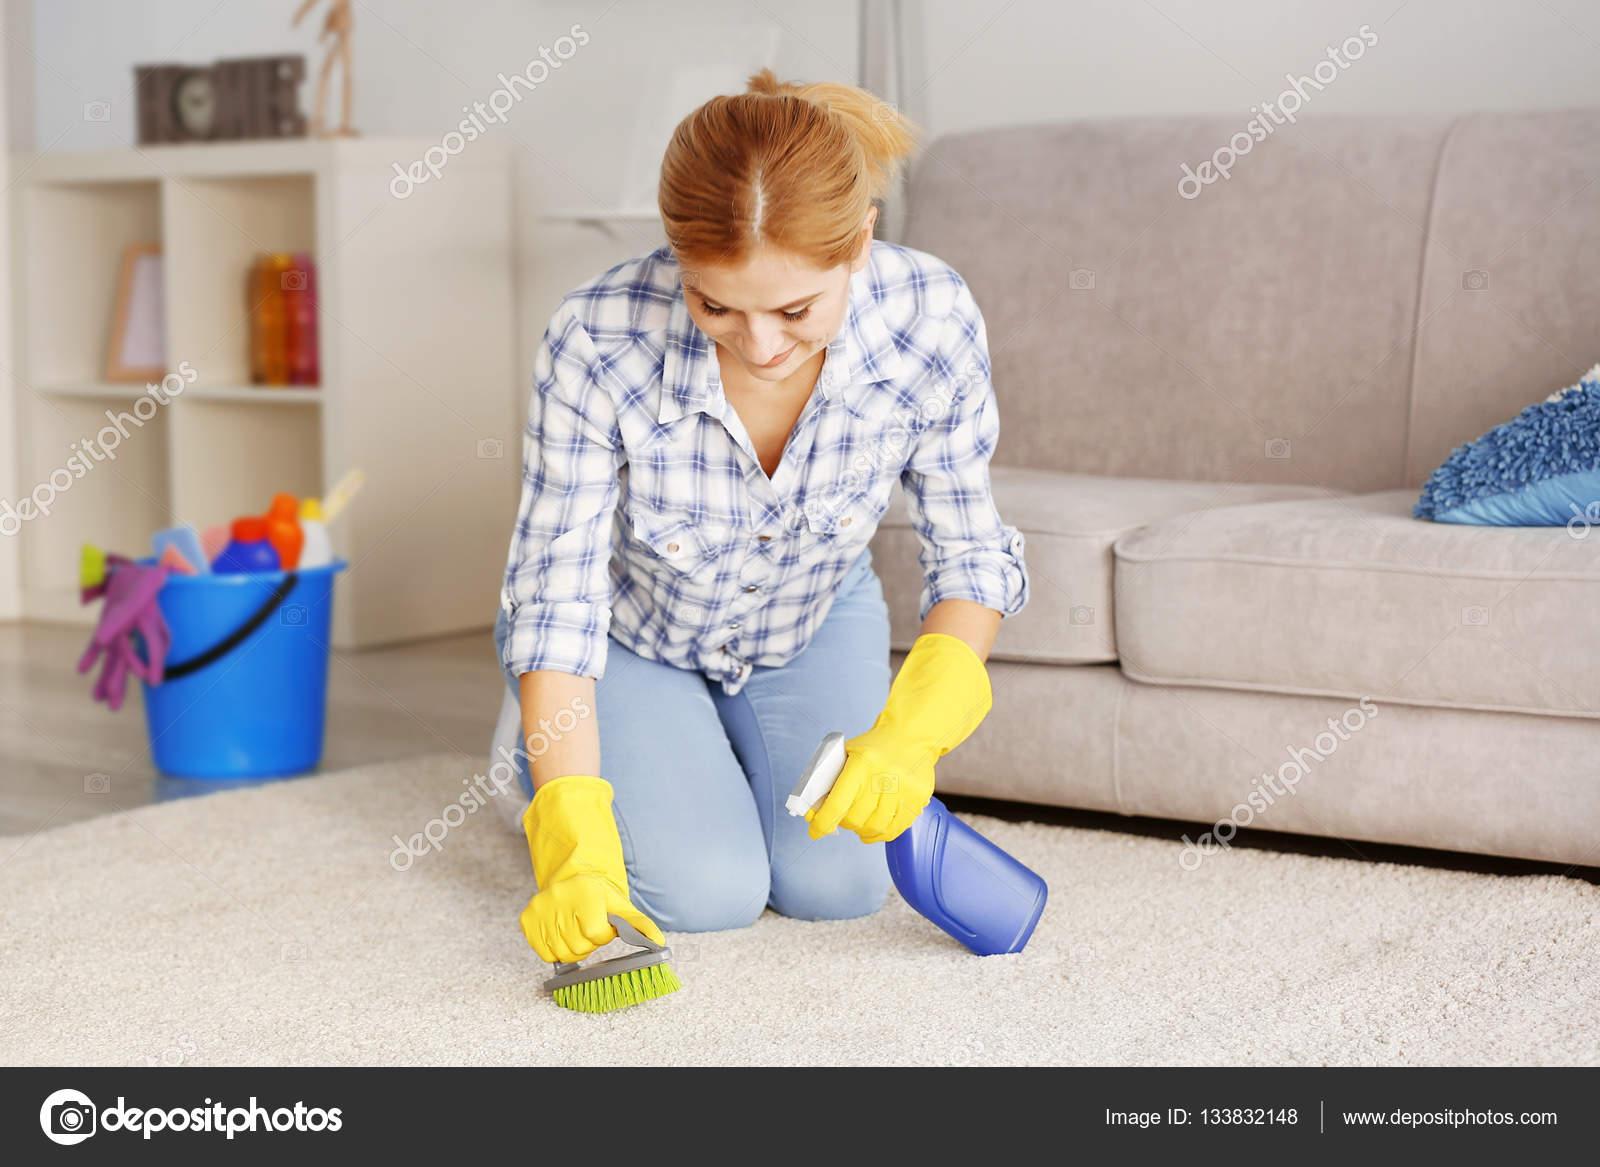 Проблема дезинфекции обуви при